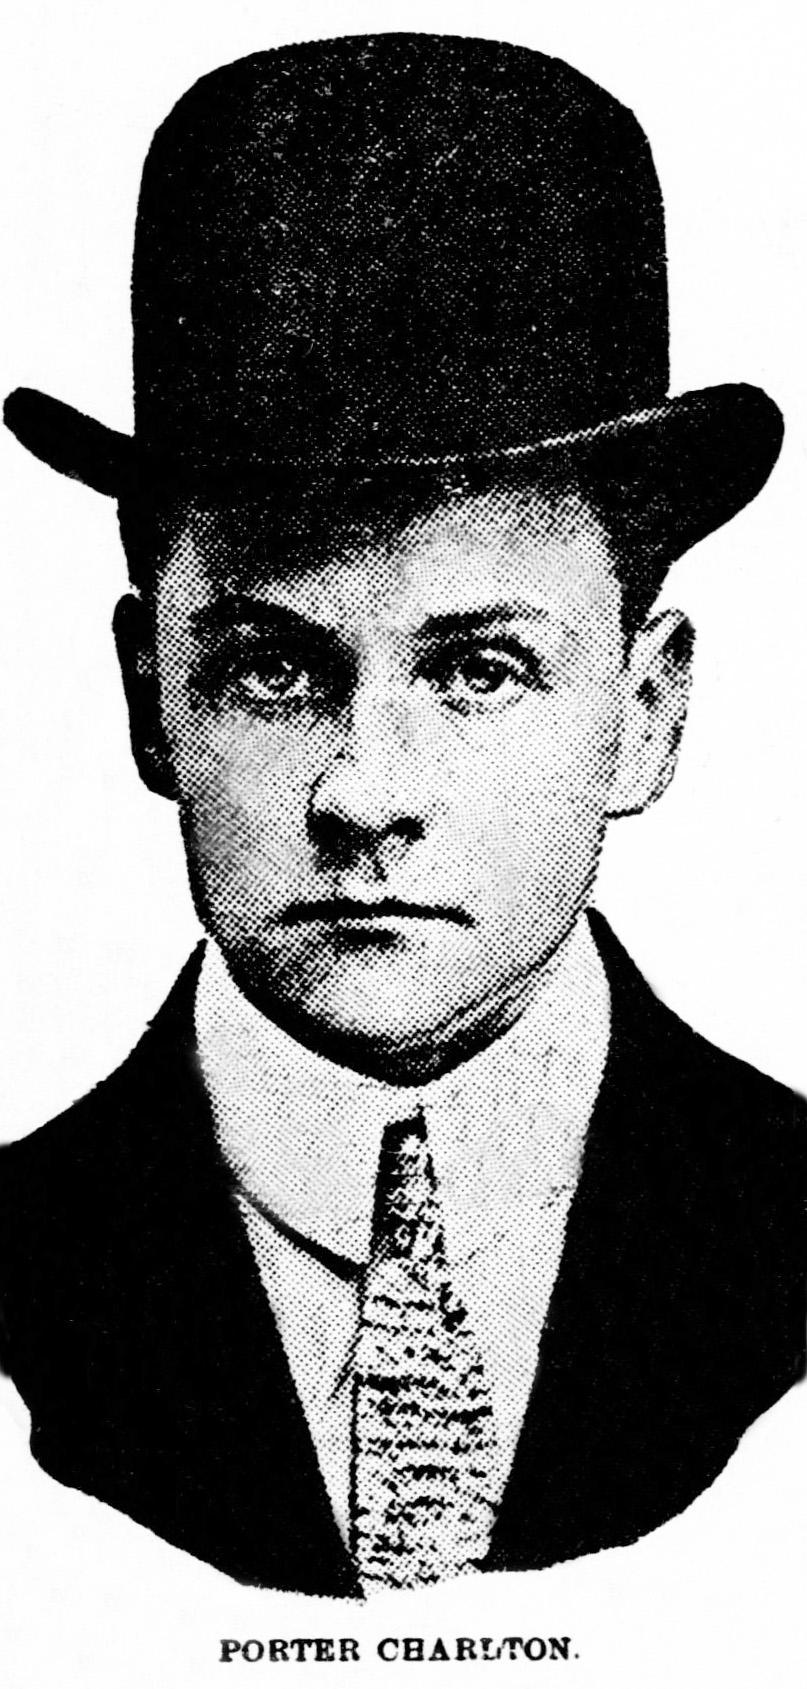 porter charlton, american murderer, lake como murder, northern italy, moltrasio villa, trunk murder, son of judge paul charlton